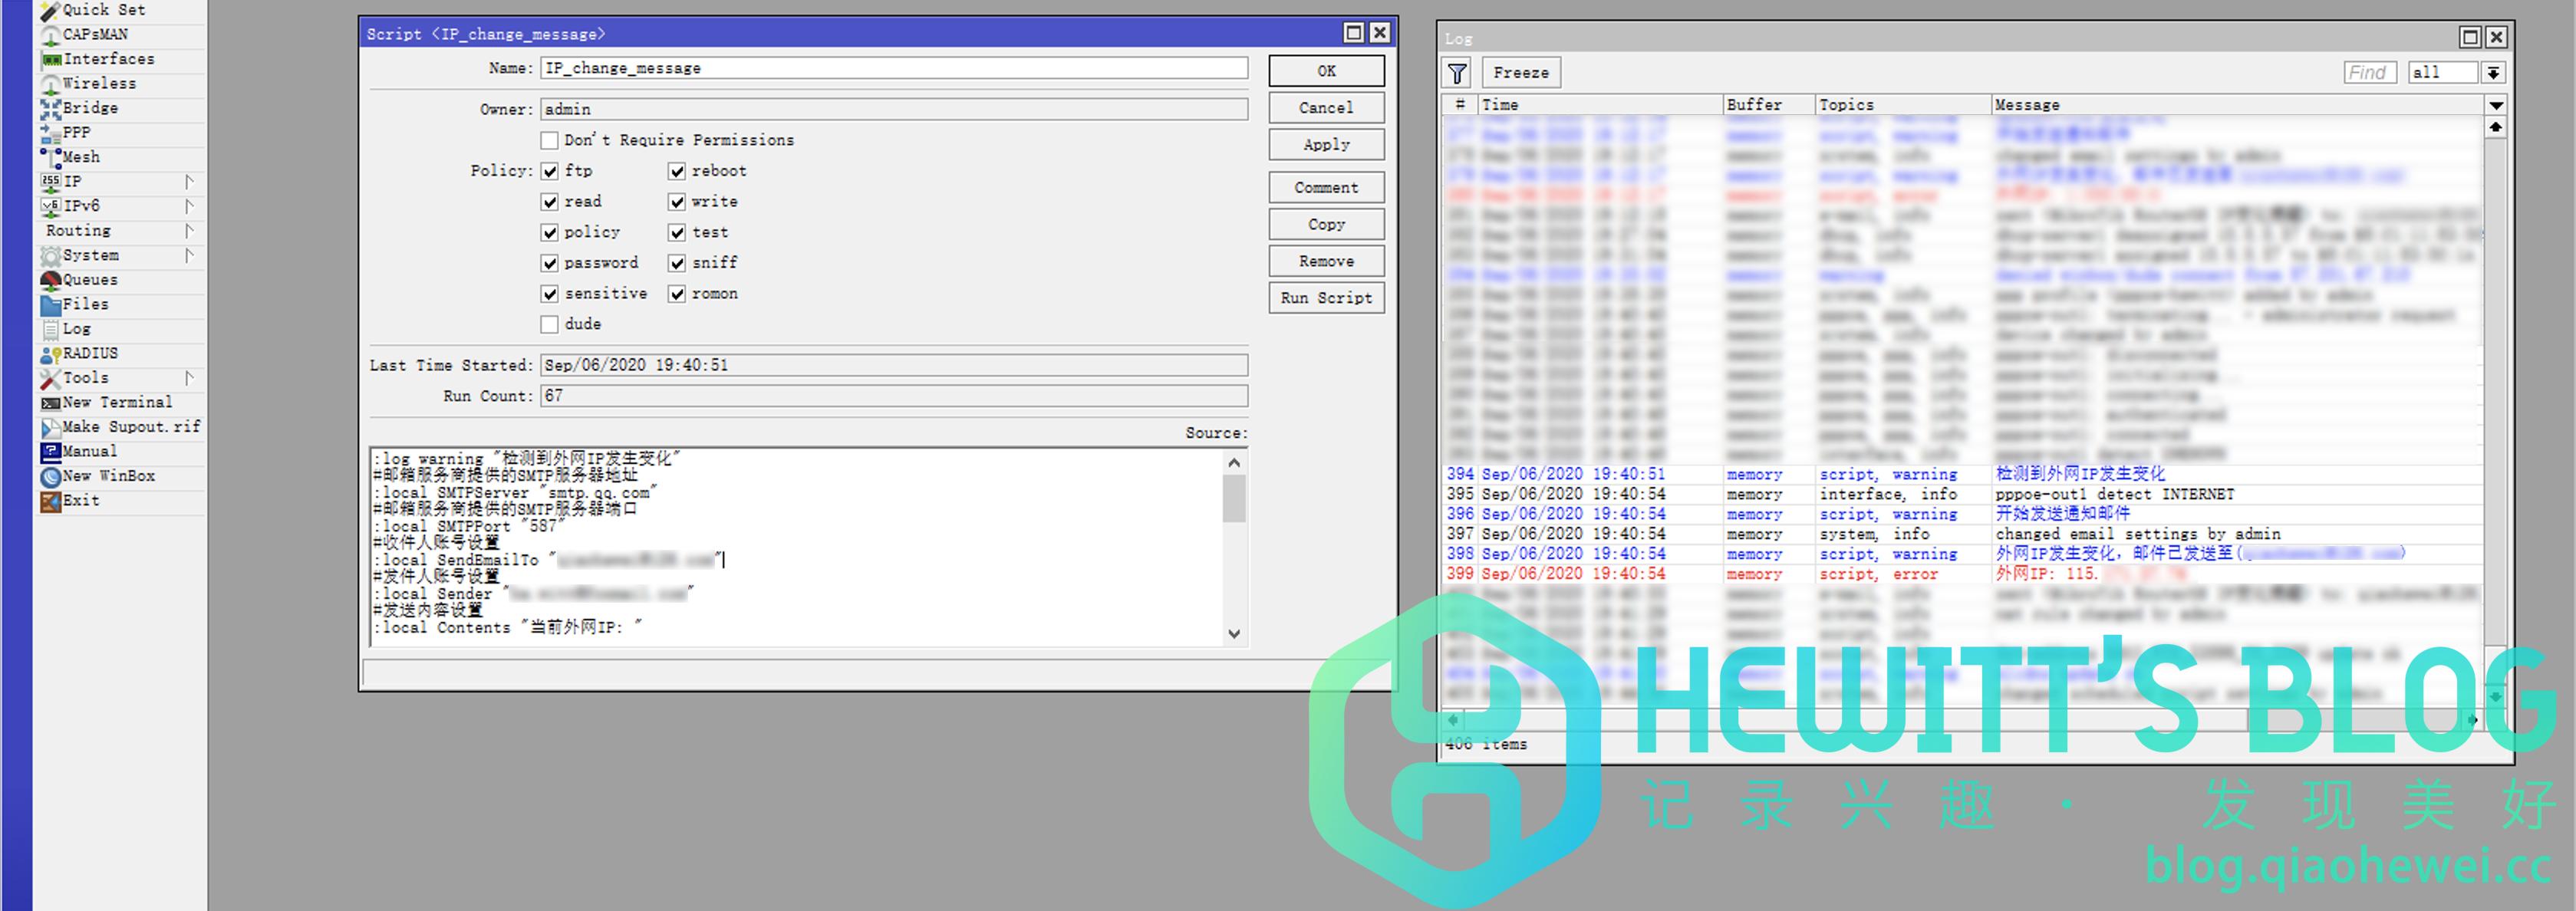 RouterOS(ROS)外网IP变化邮件通知并显示CPU占用率和剩余内存脚本插图9